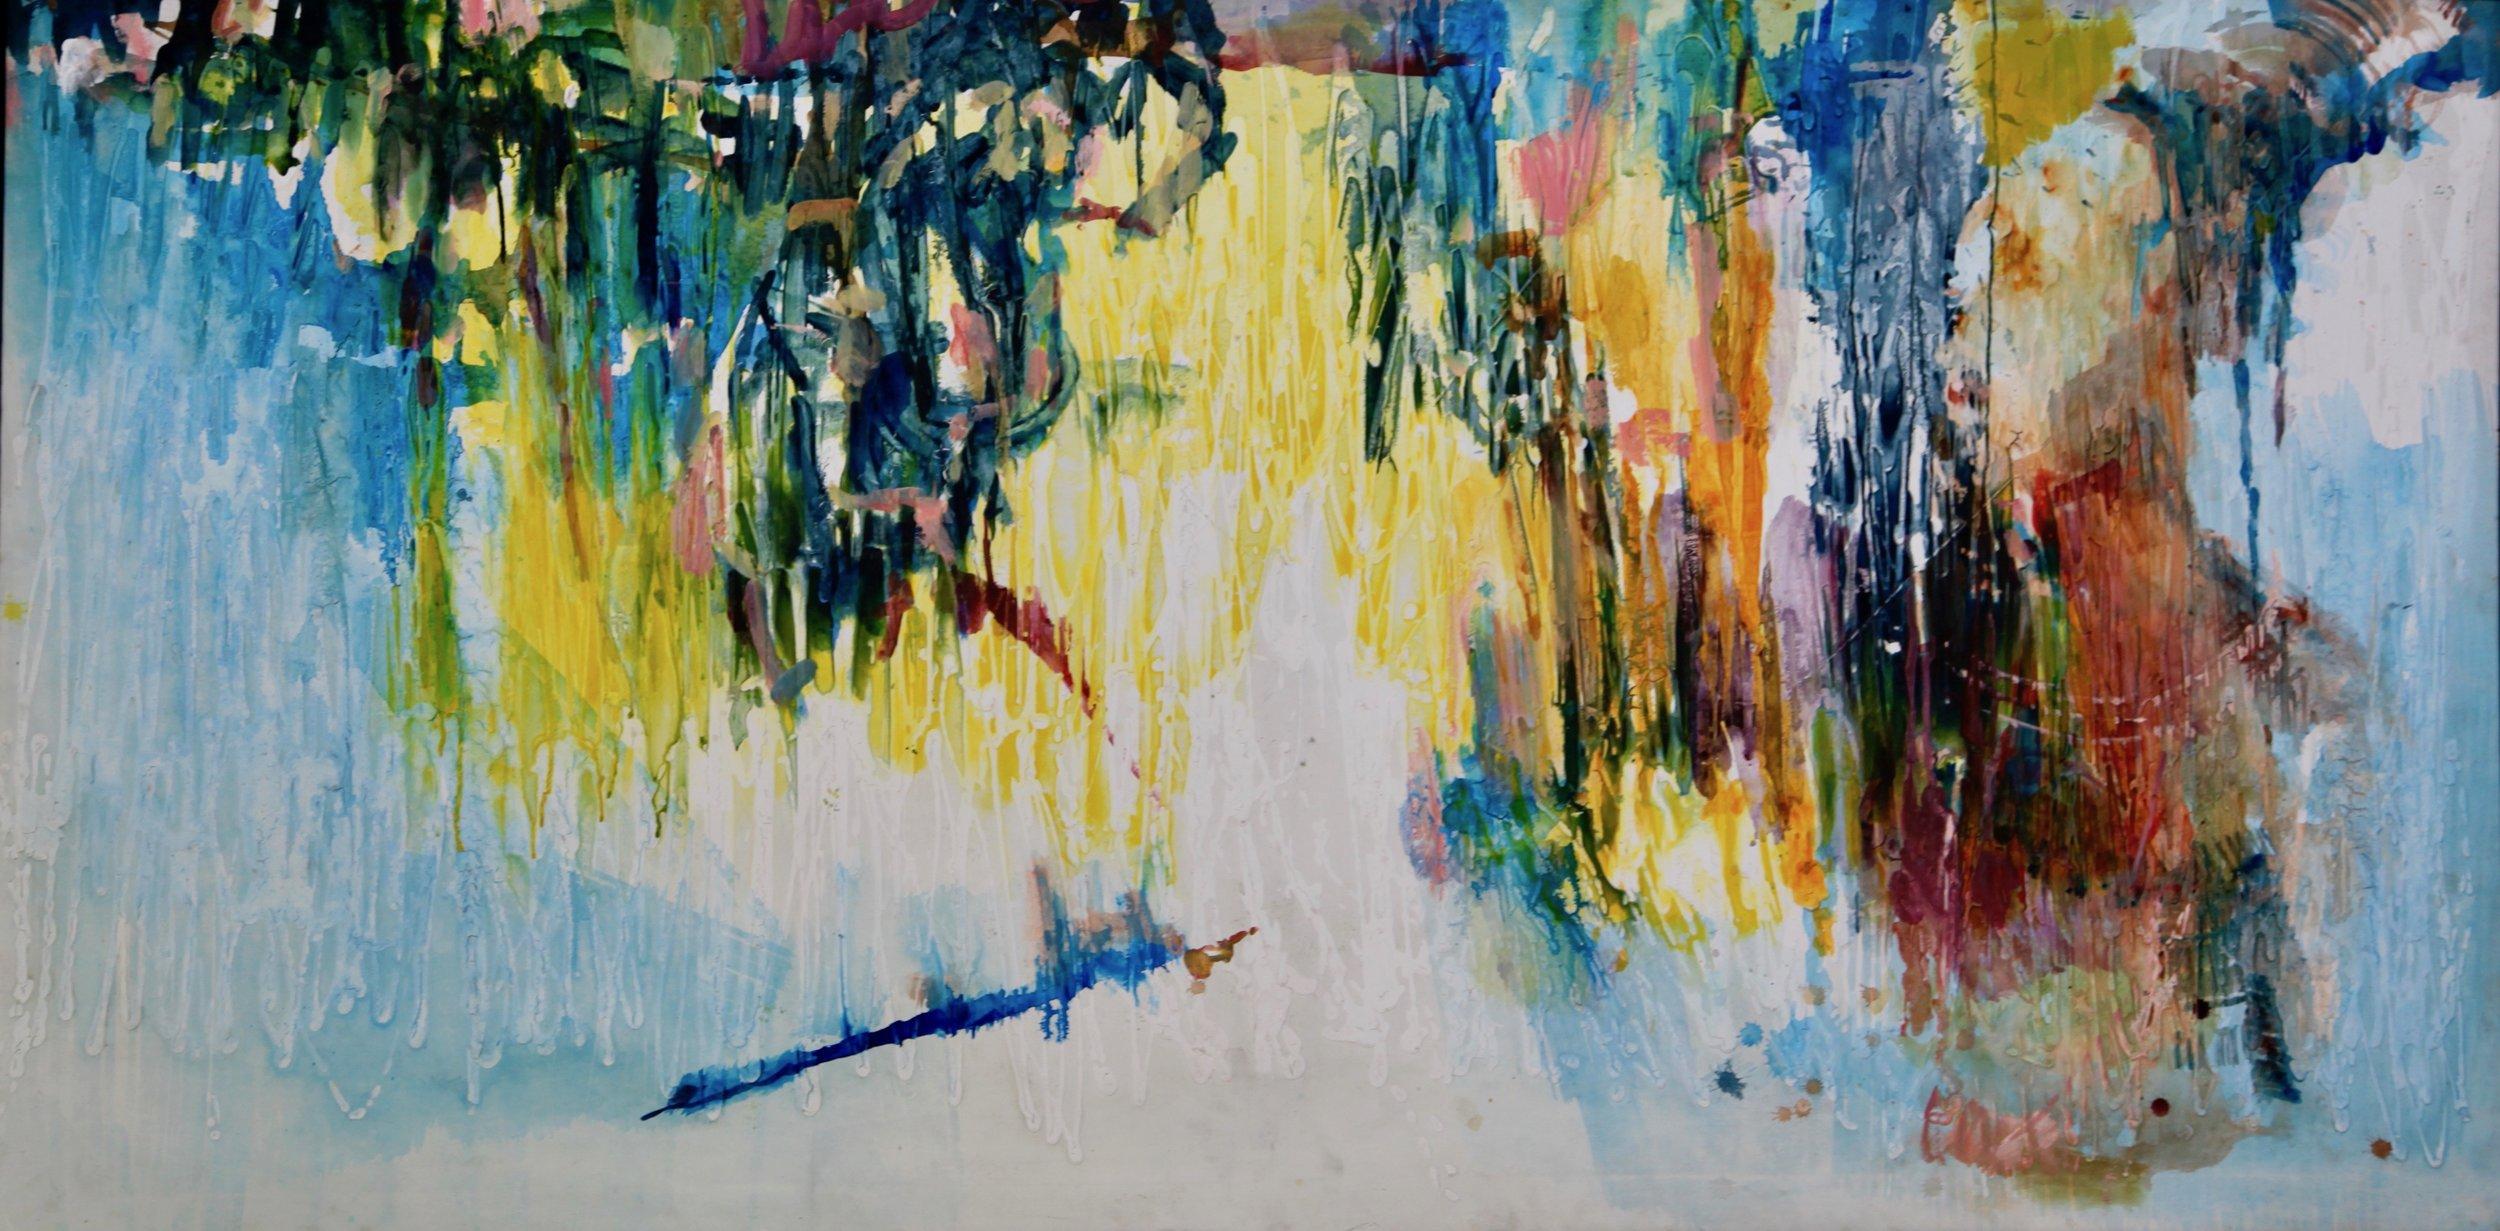 Village Square II, Acrylic on canvas, 108.5 x 214 cm, 2017.jpg